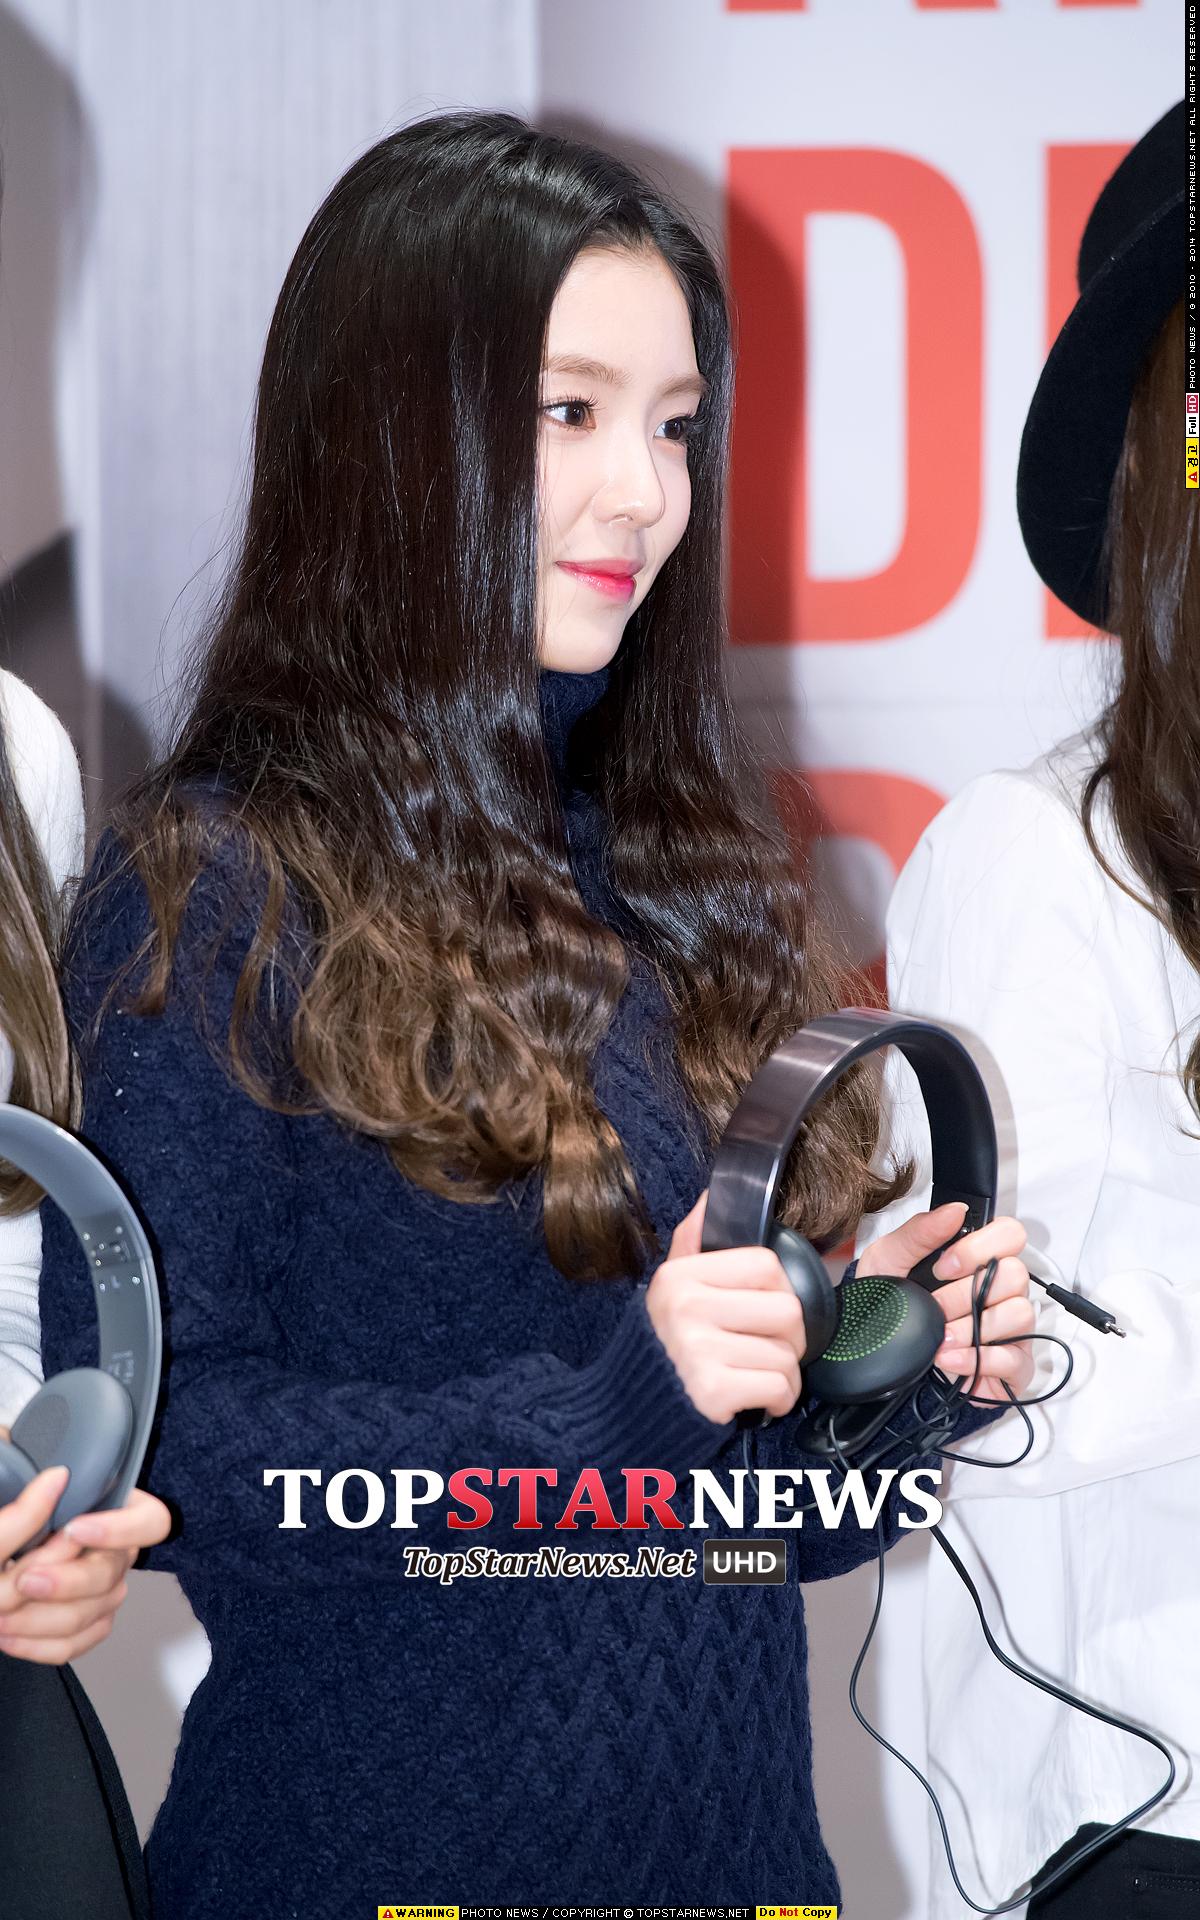 2.Irene 最近Irene的美貌一直不斷受到關注,這張真的好美膩♥